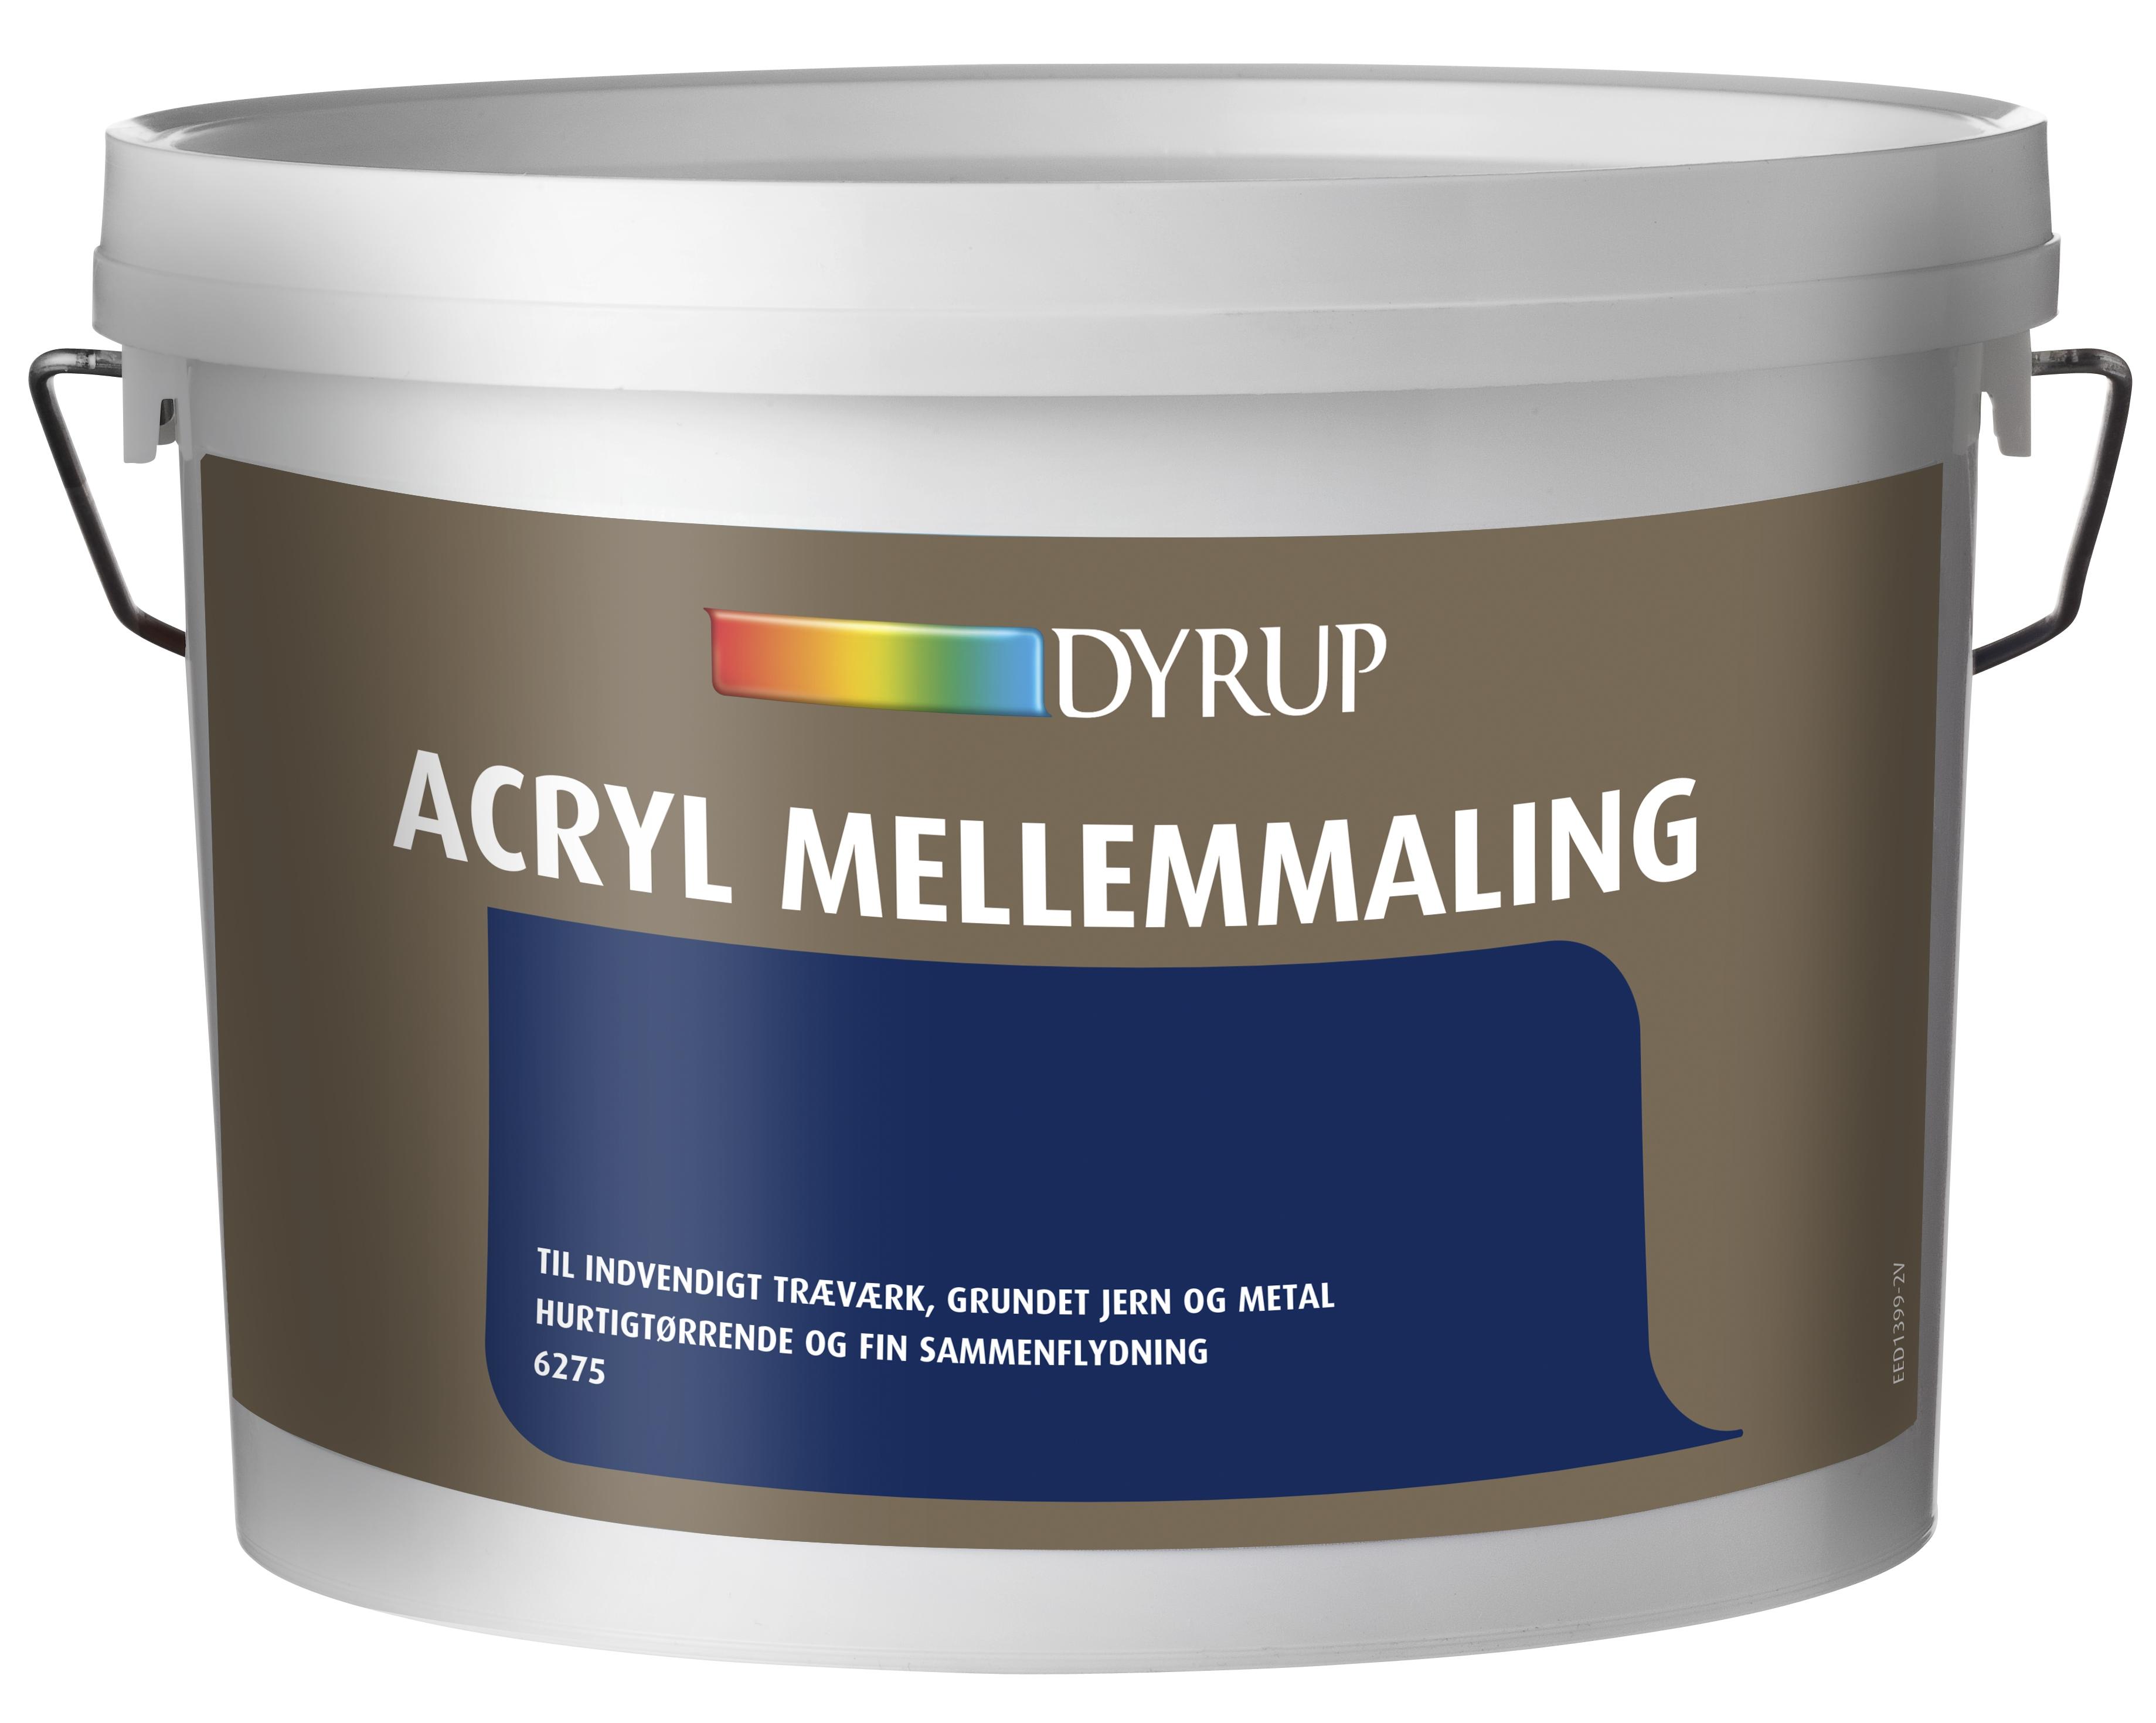 Bestil Dyrup Acryl mellemmaling/grundmaling er. Op til 35% rabat